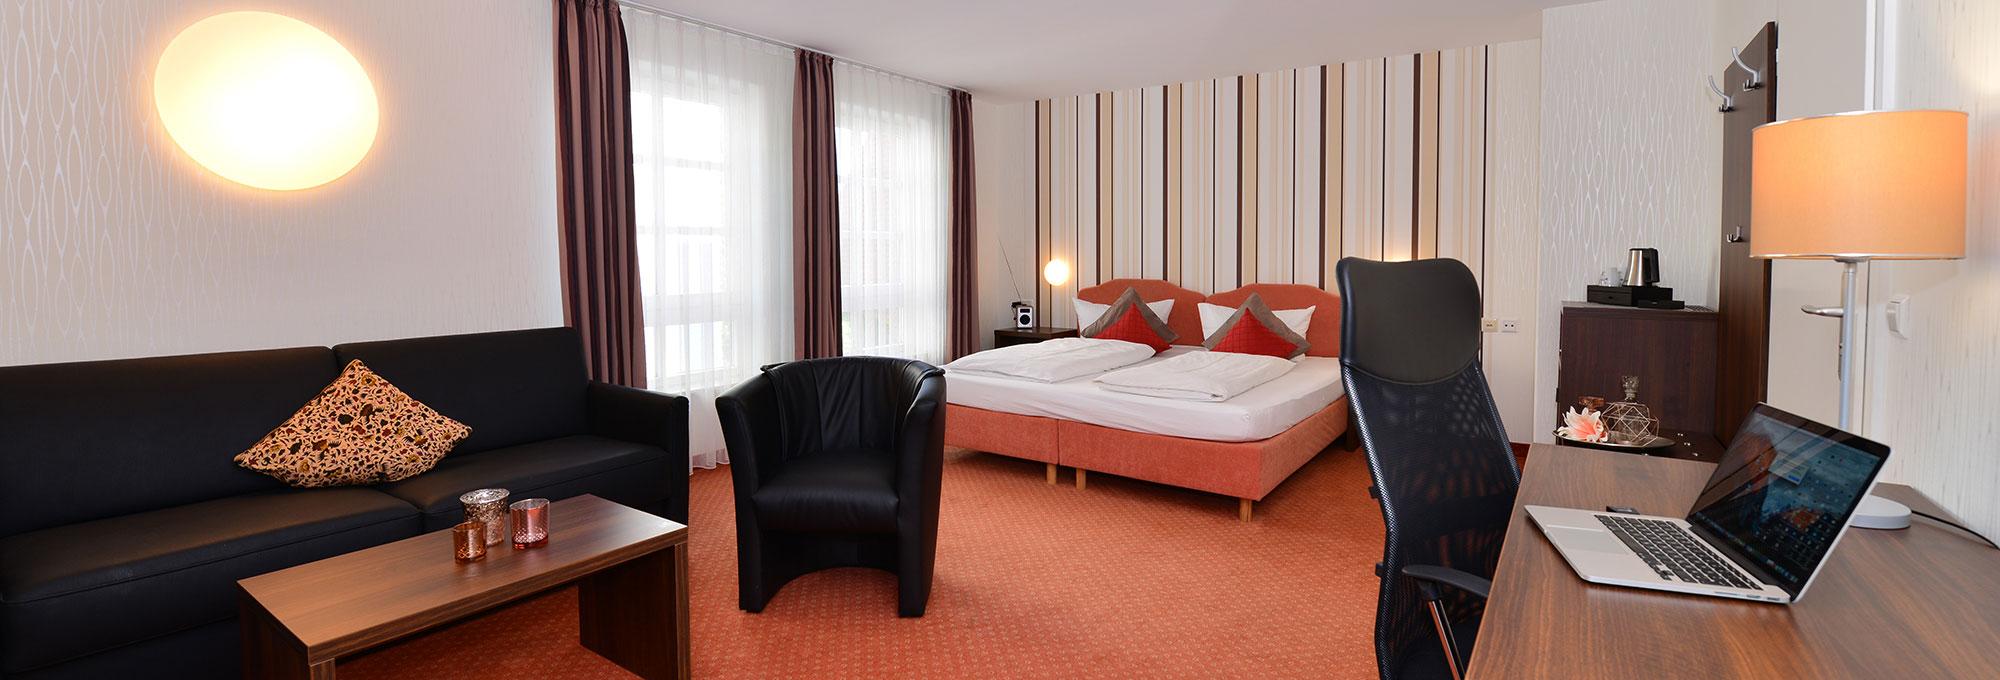 Zimmer in Langenau